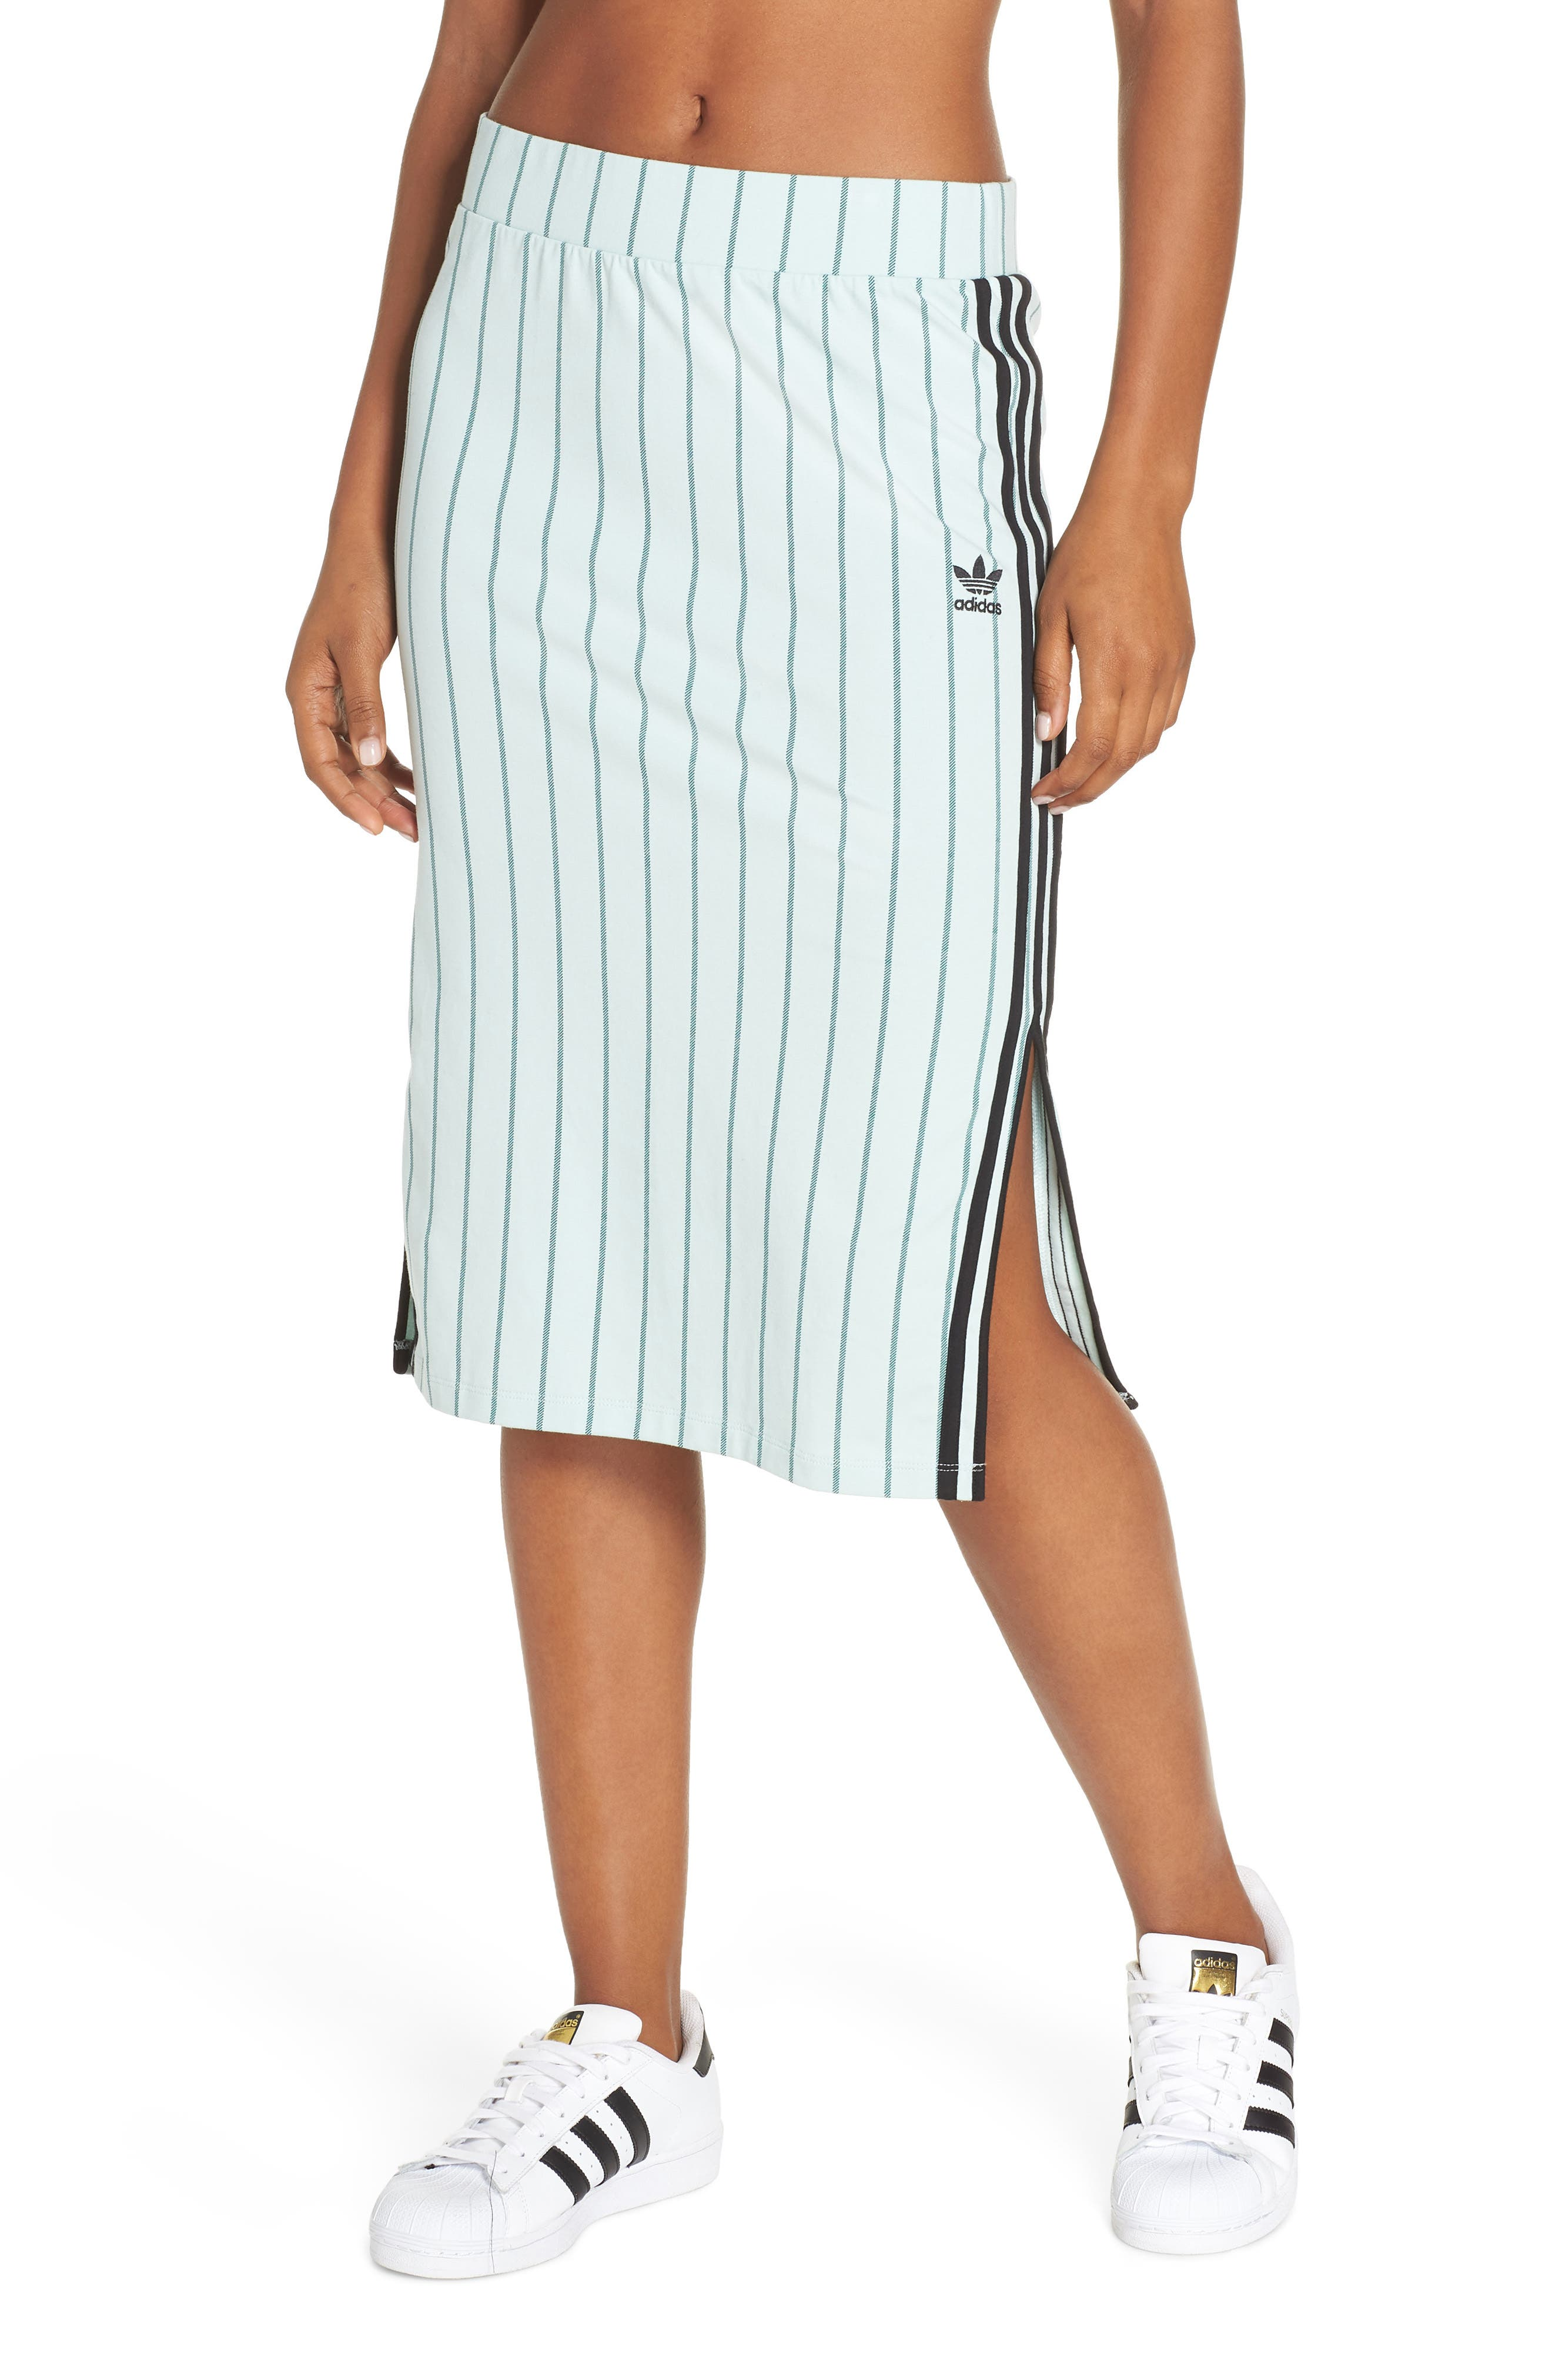 Adidas Slim Fit Baseball Pencil Skirt, Green